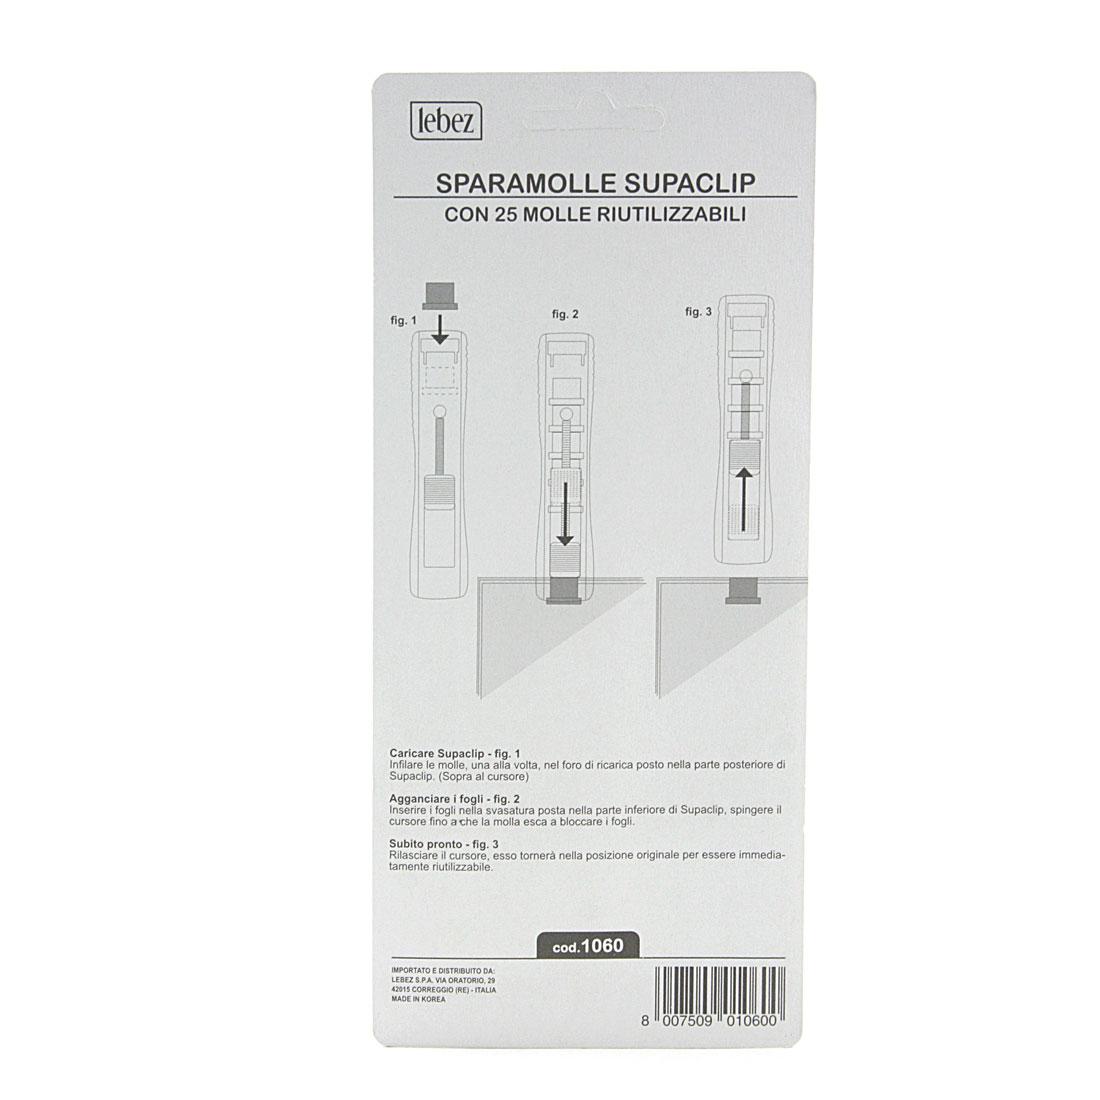 4b7207c601 SPARAMOLLE SUPACLIP 1060 - MOLLE - CLIP - Mazzarella